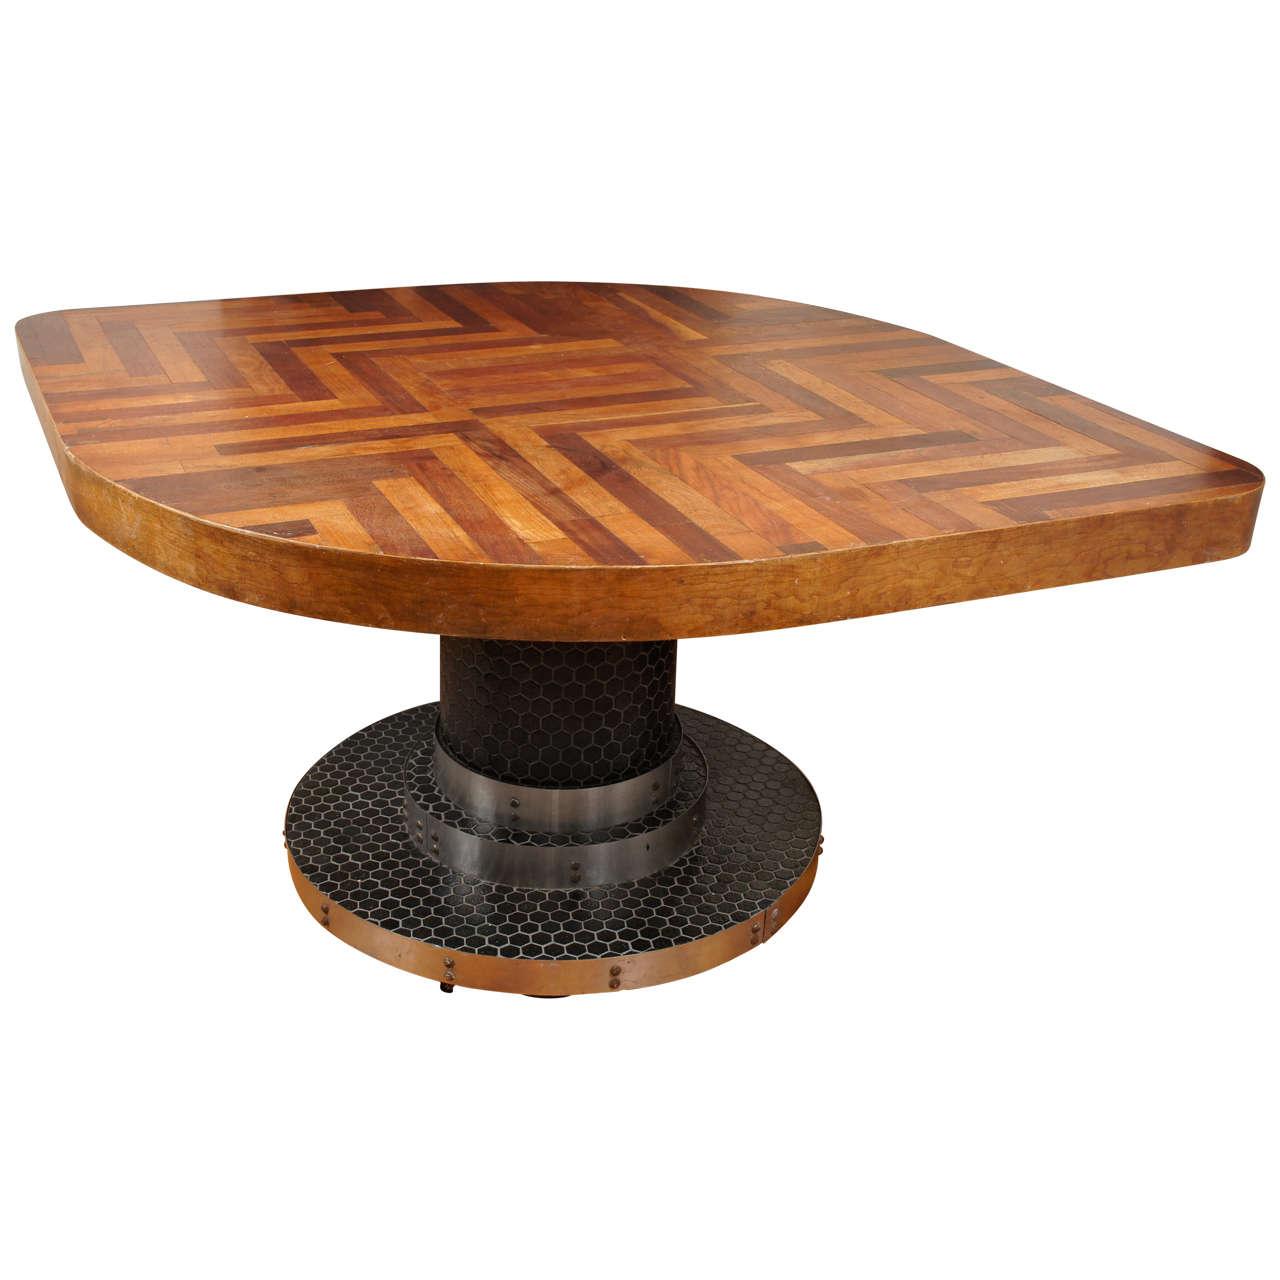 weird shaped chairs chair cover rentals fairfax va unusual diamond wood table at 1stdibs